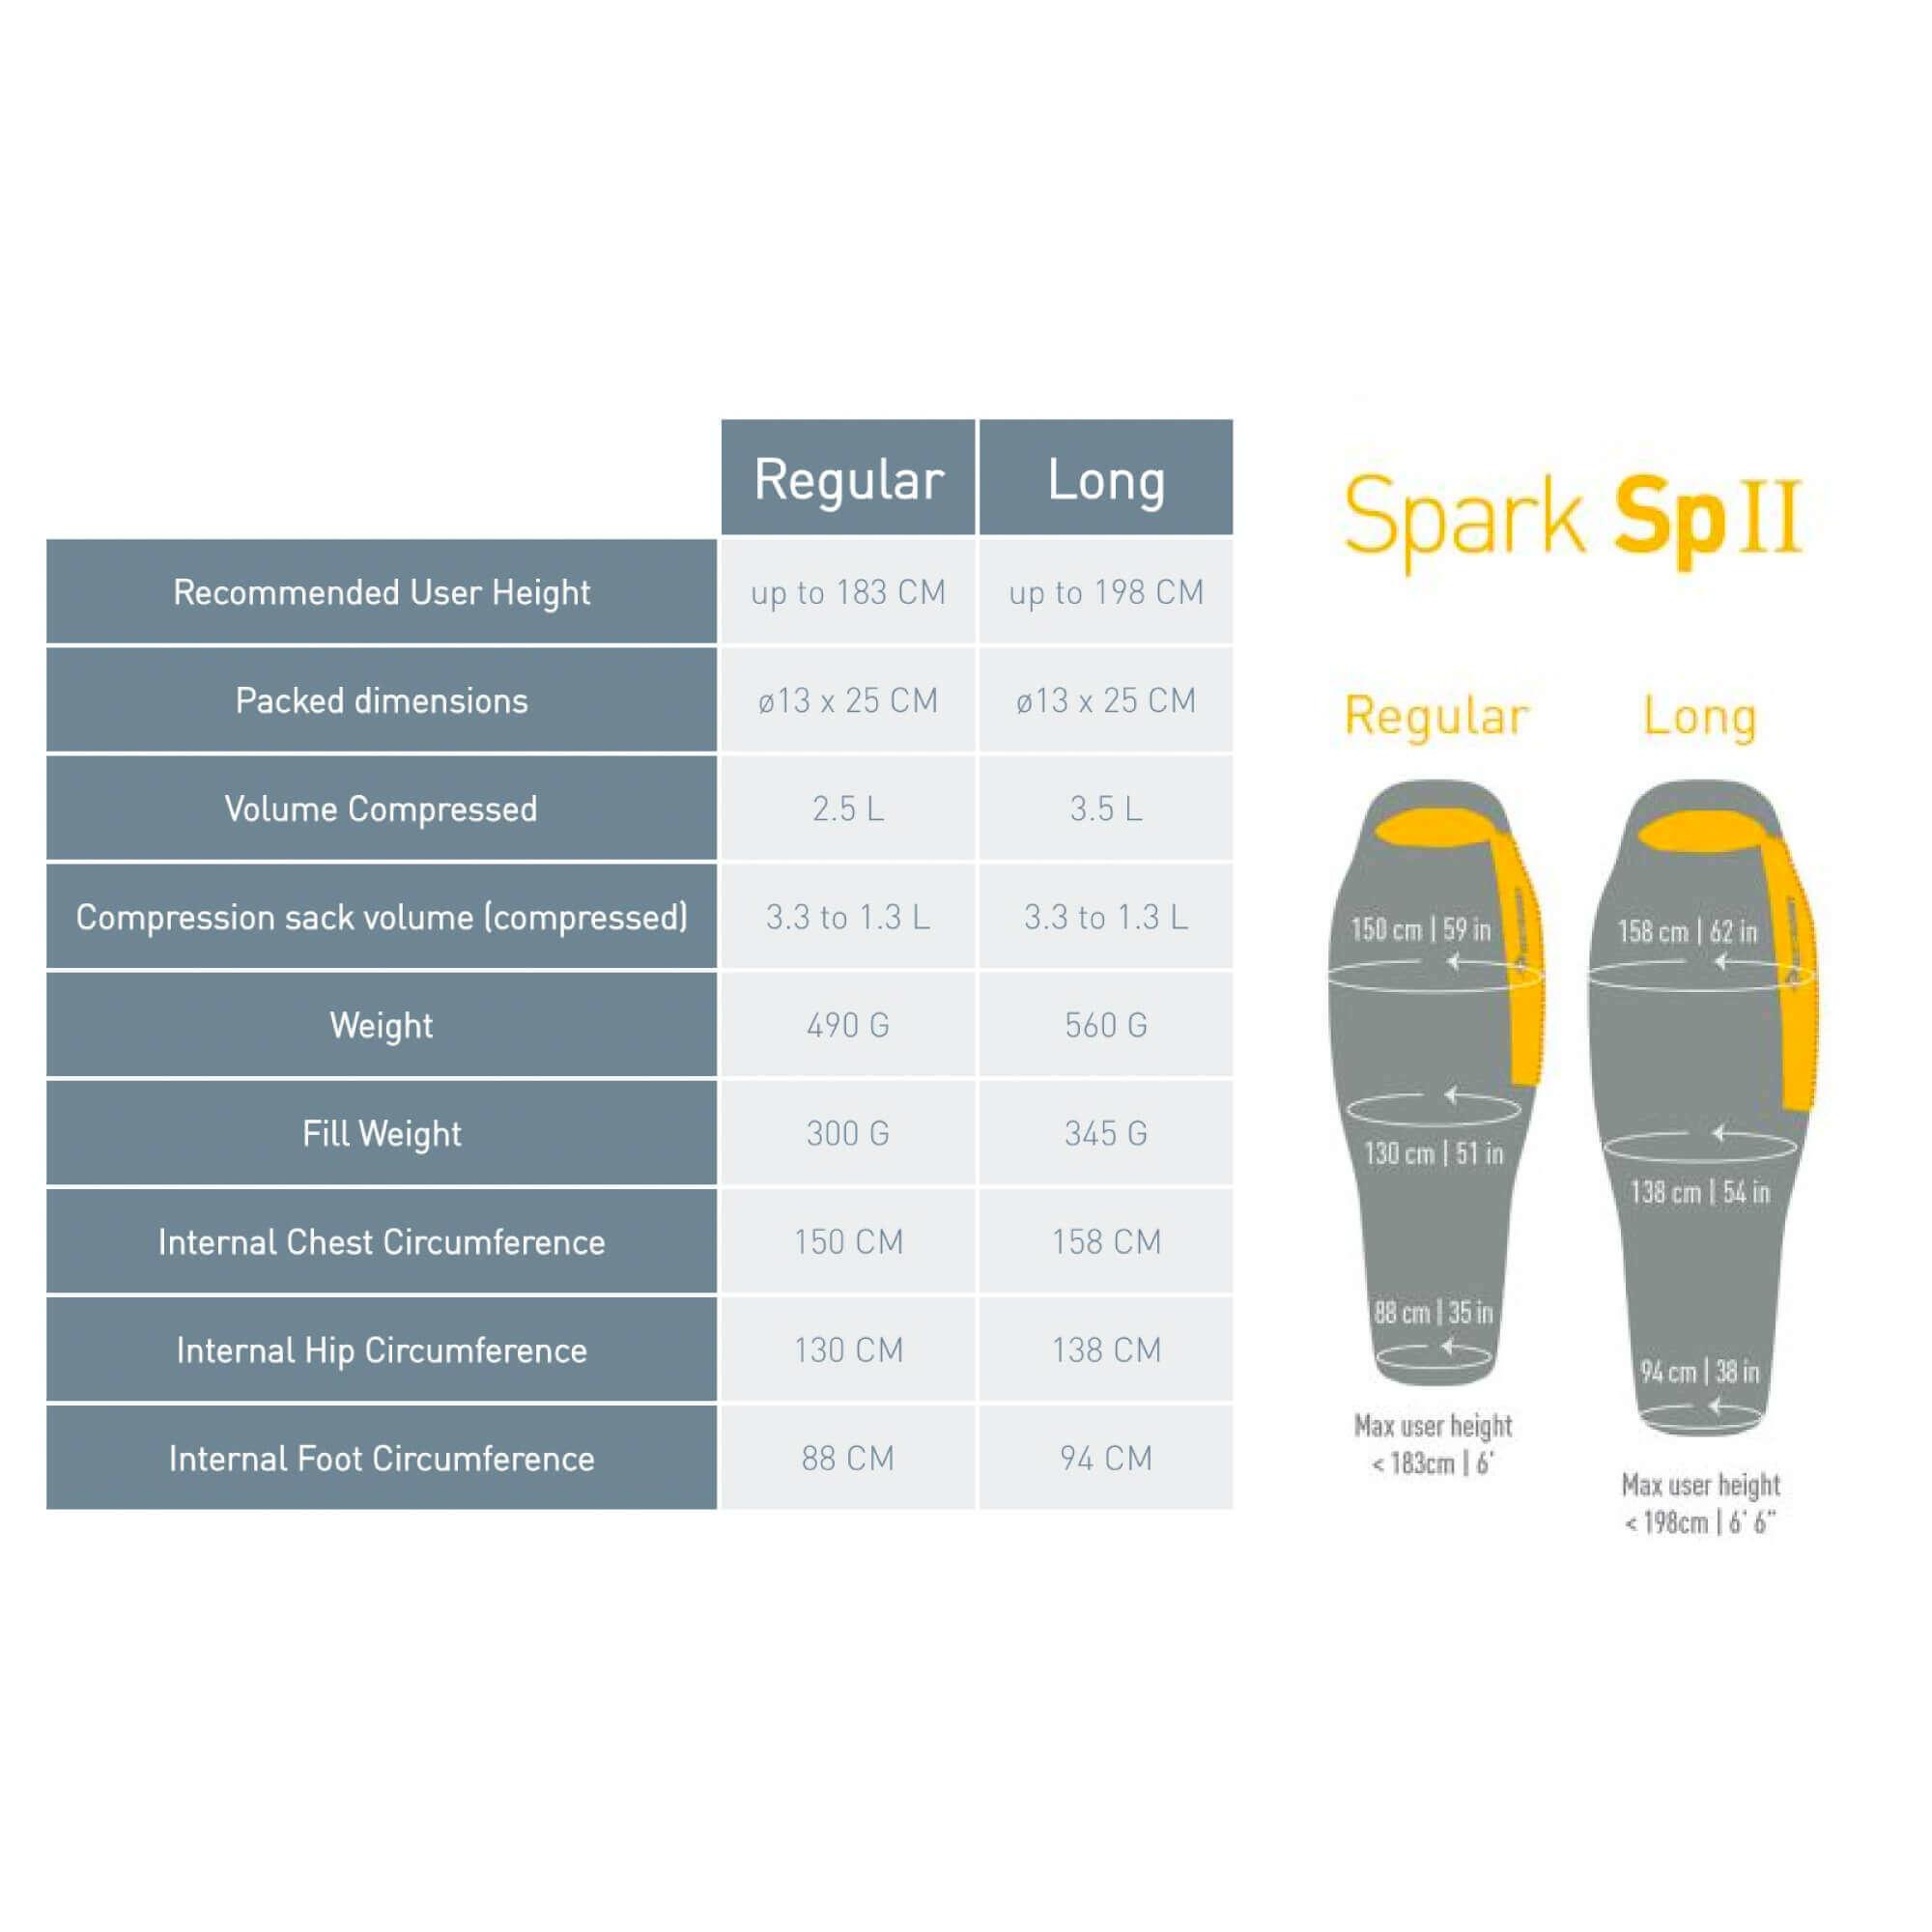 Spark SPII Regular Left Zip-7